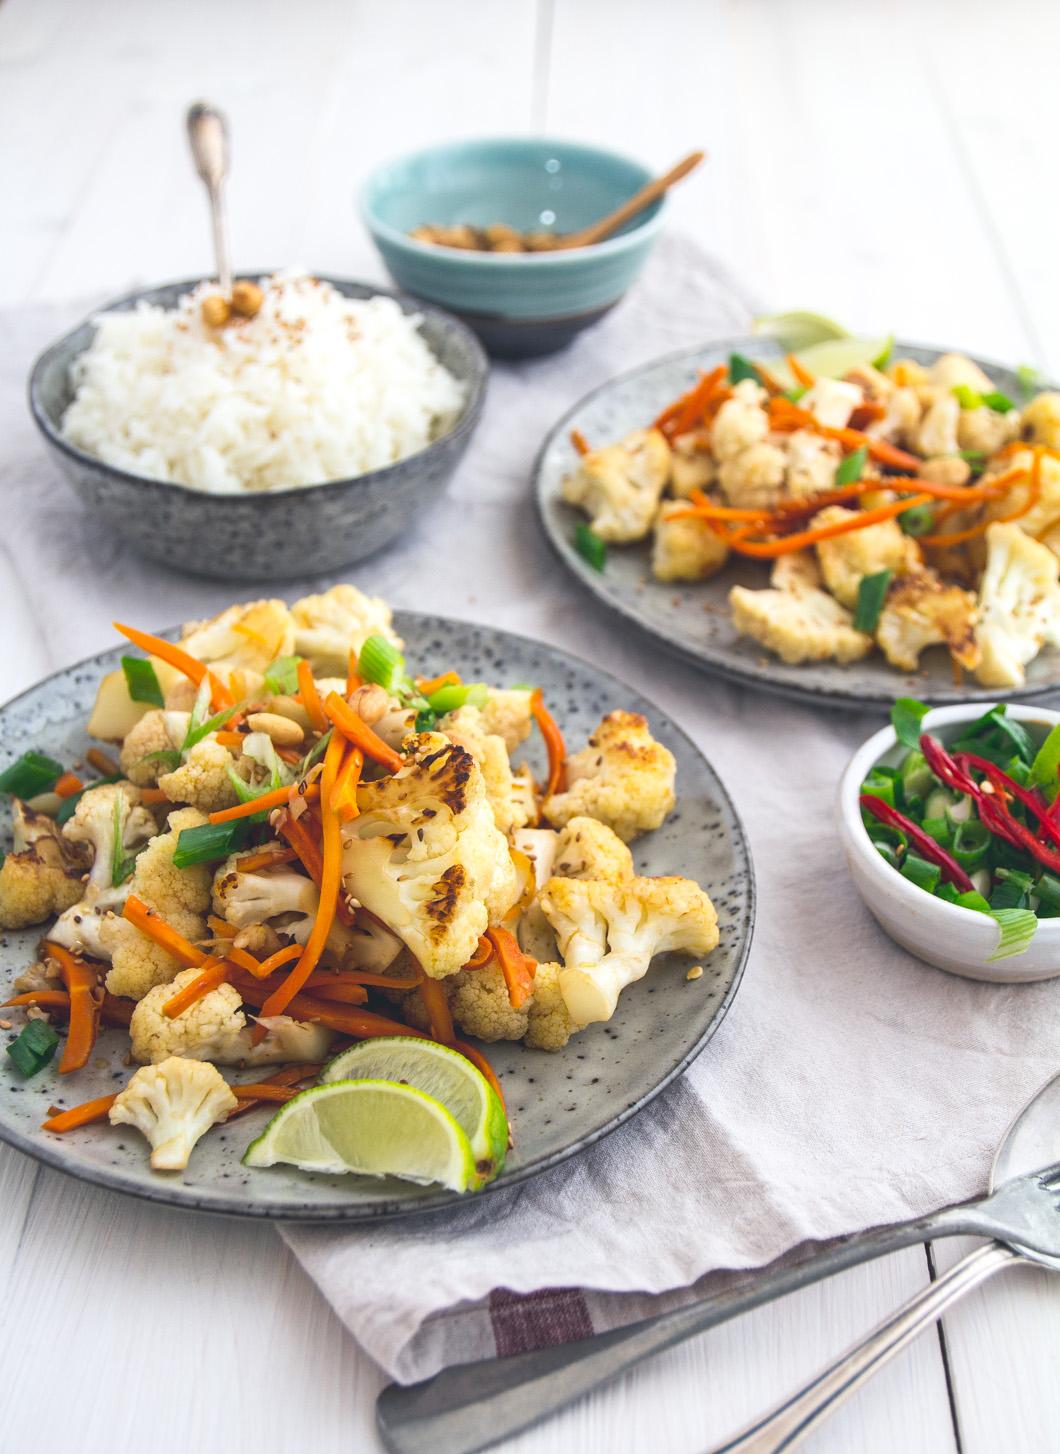 asiatischer blumenkohl salat eat this foodblog vegane rezepte stories. Black Bedroom Furniture Sets. Home Design Ideas